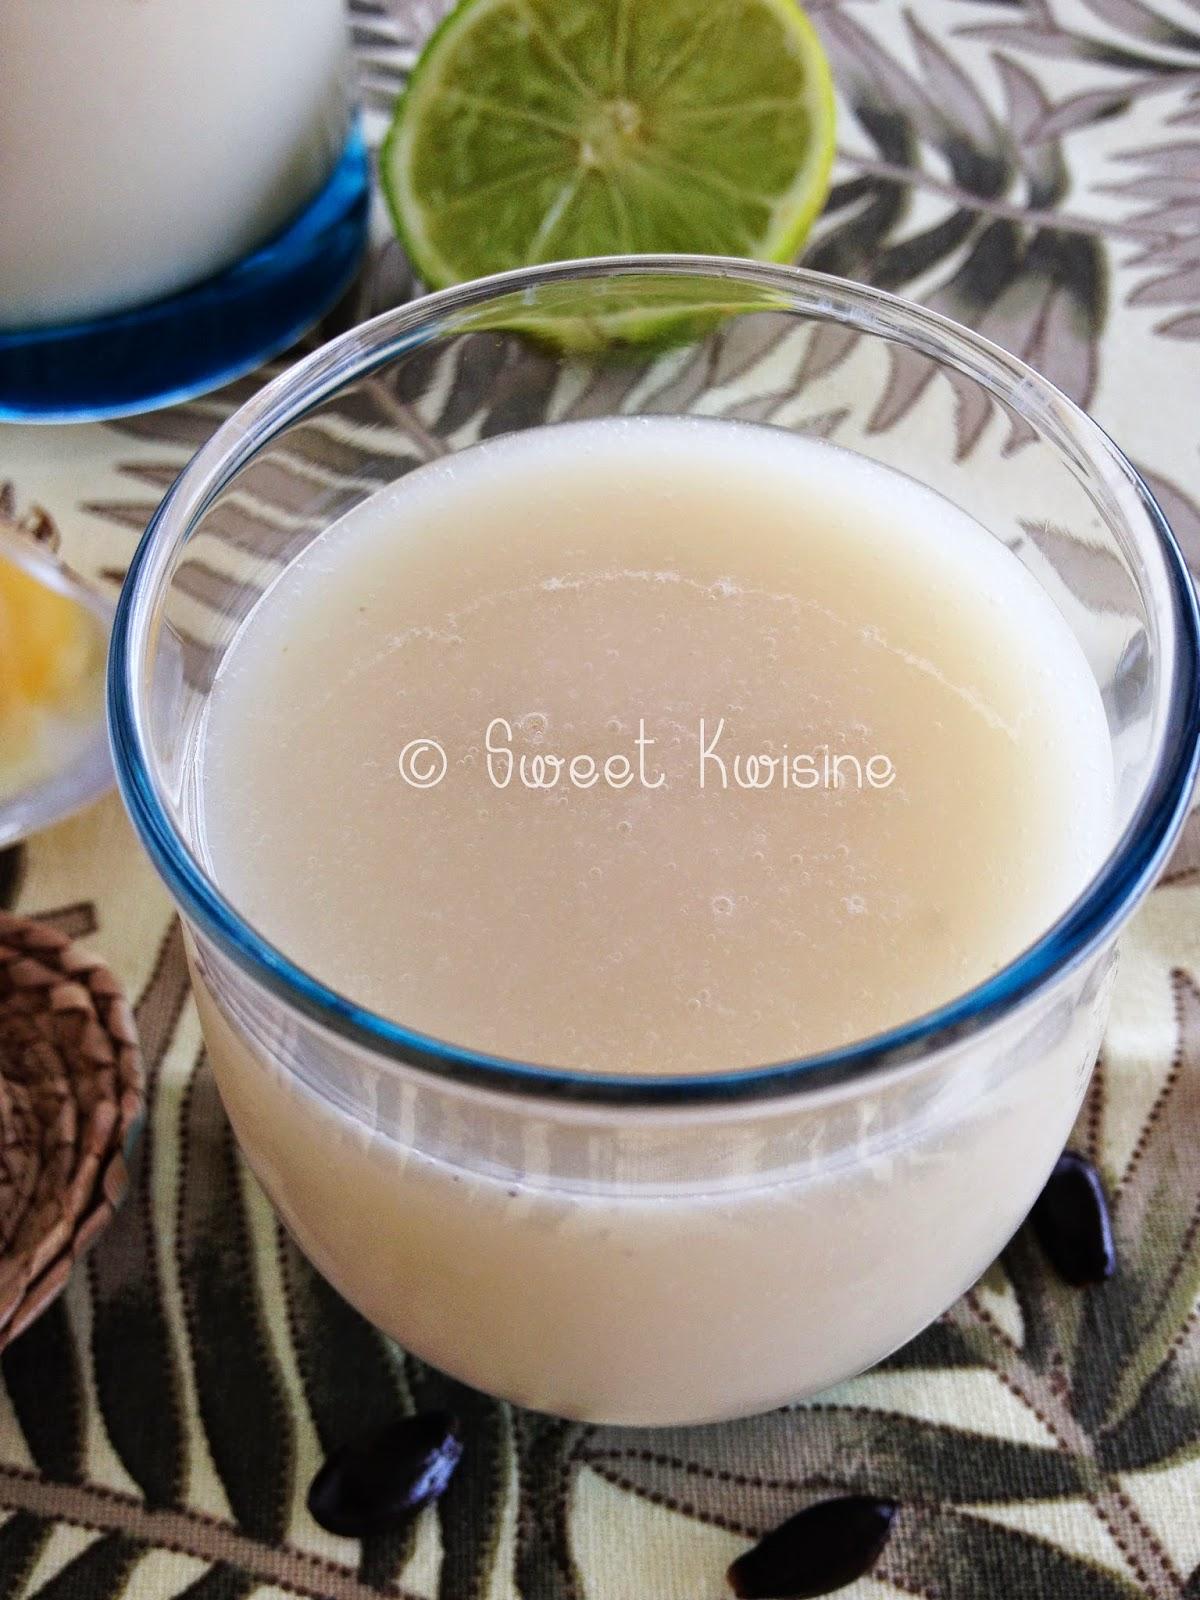 Sweet Kwisine, corossol, jus, Martinique, guanabana,soursop